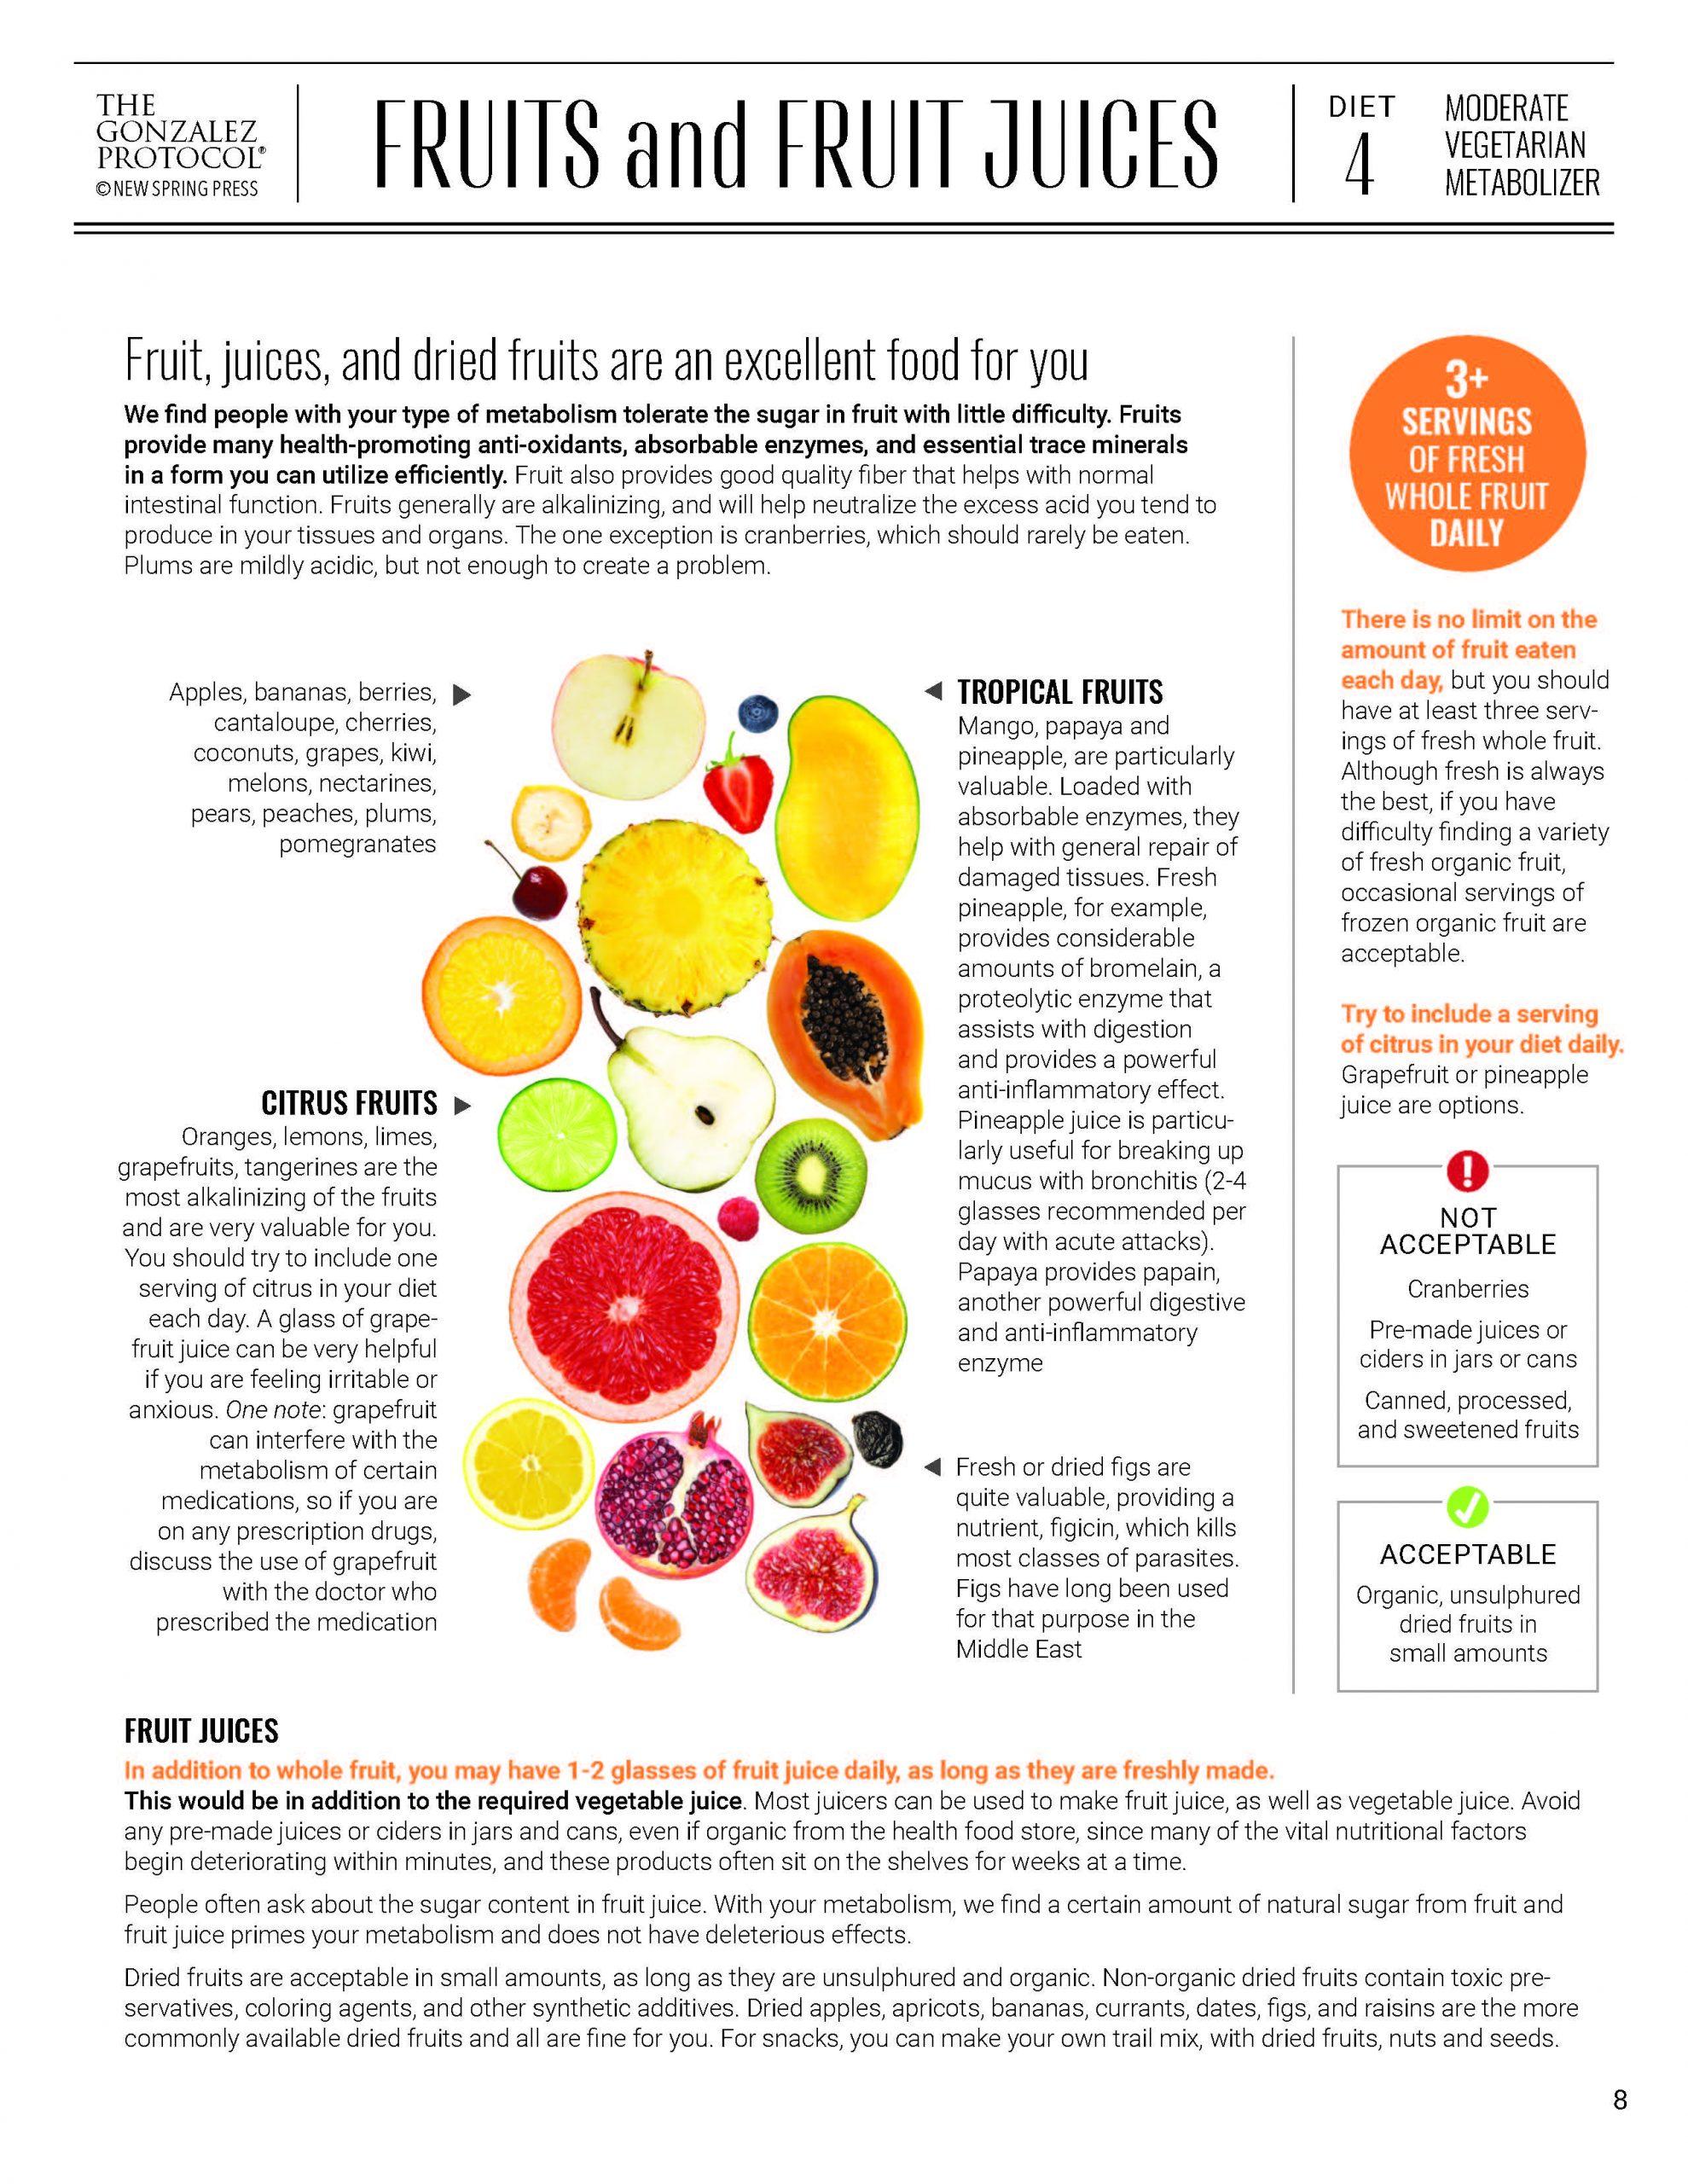 Moderate Vegetarian FRUITS